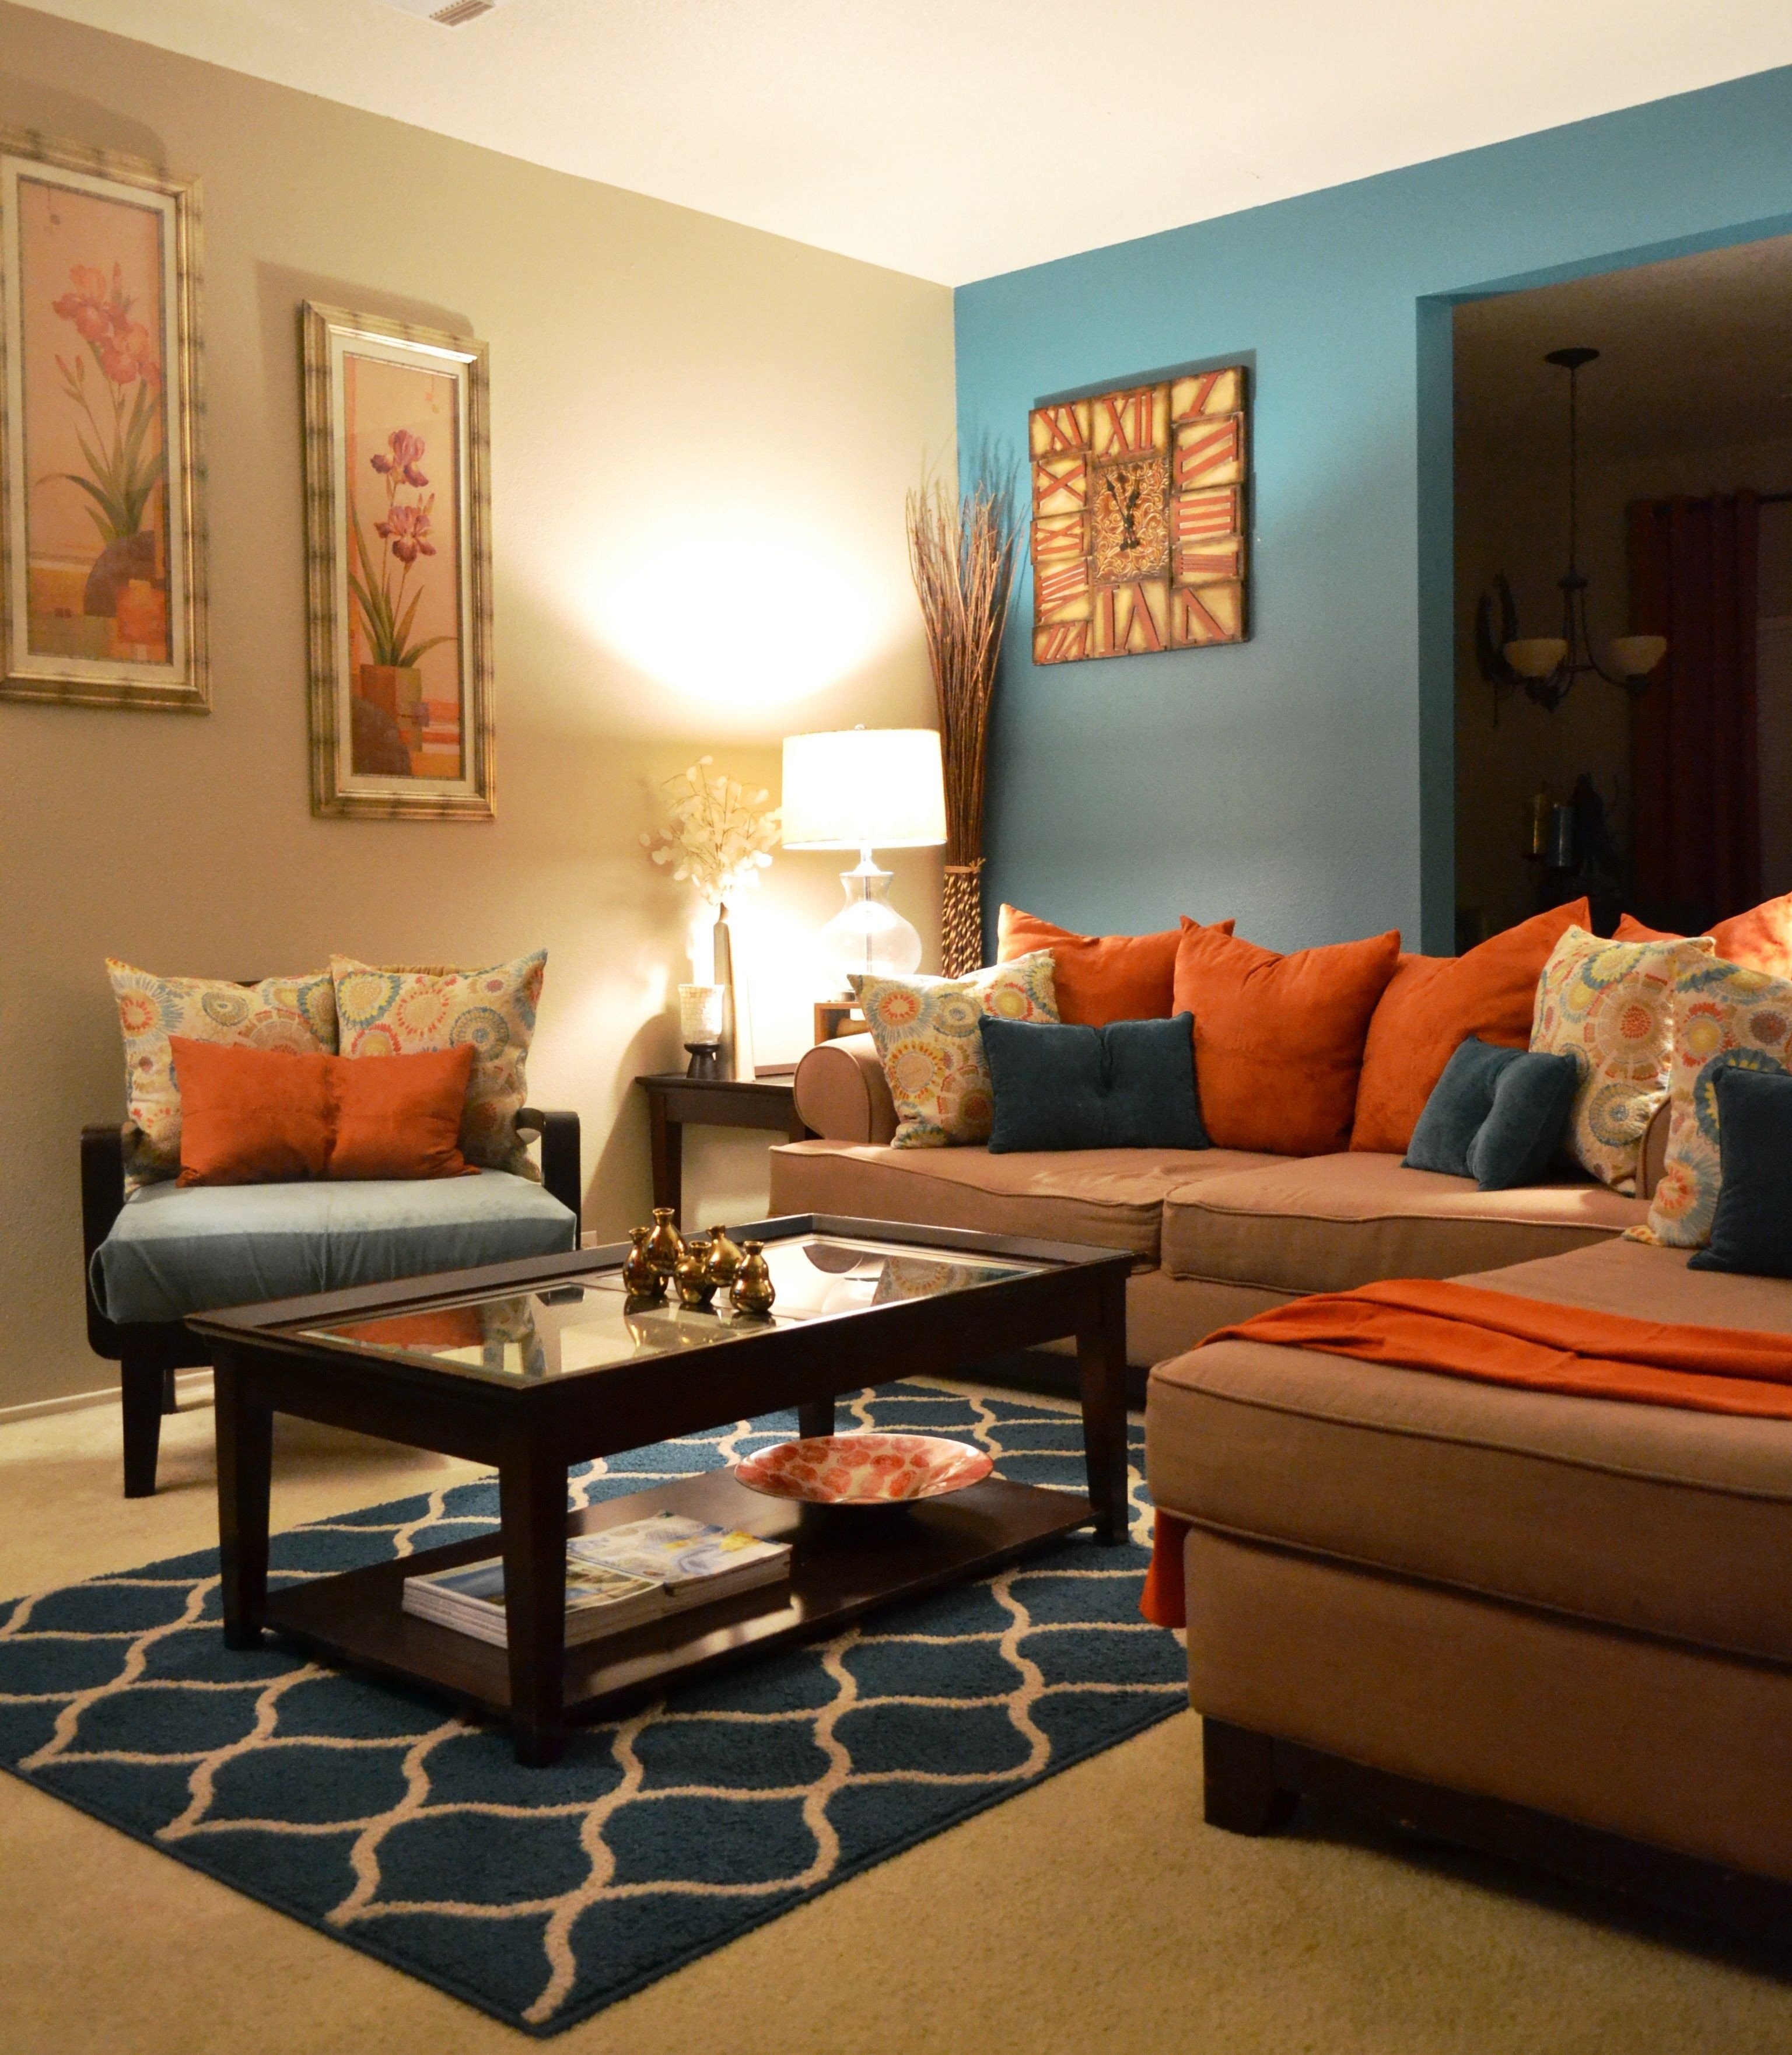 Orange Decor for Living Room Rugs Coffee Table Pillows Teal orange Living Room